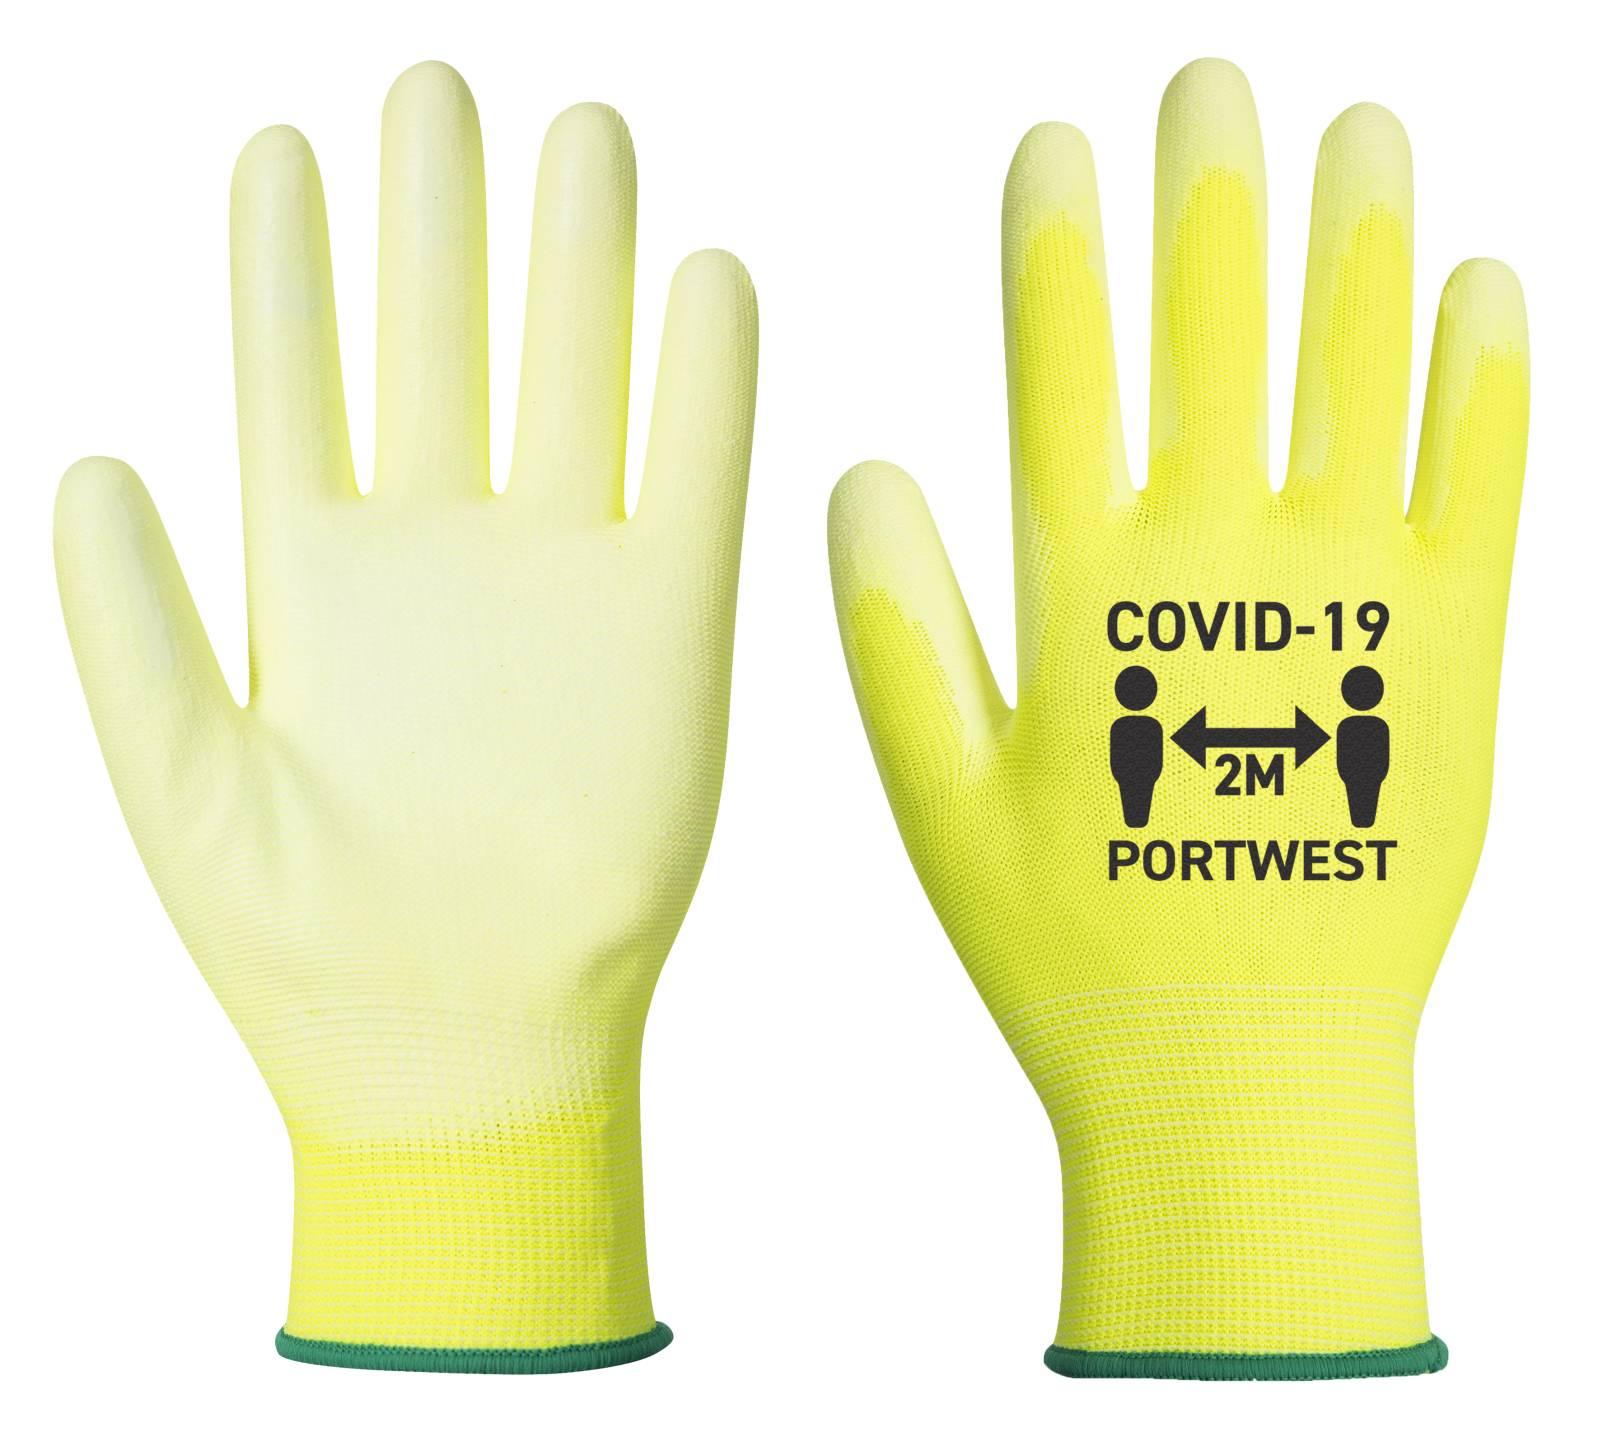 Portwest Covid PU Handschoenen CV20 geel-wit(Y6)